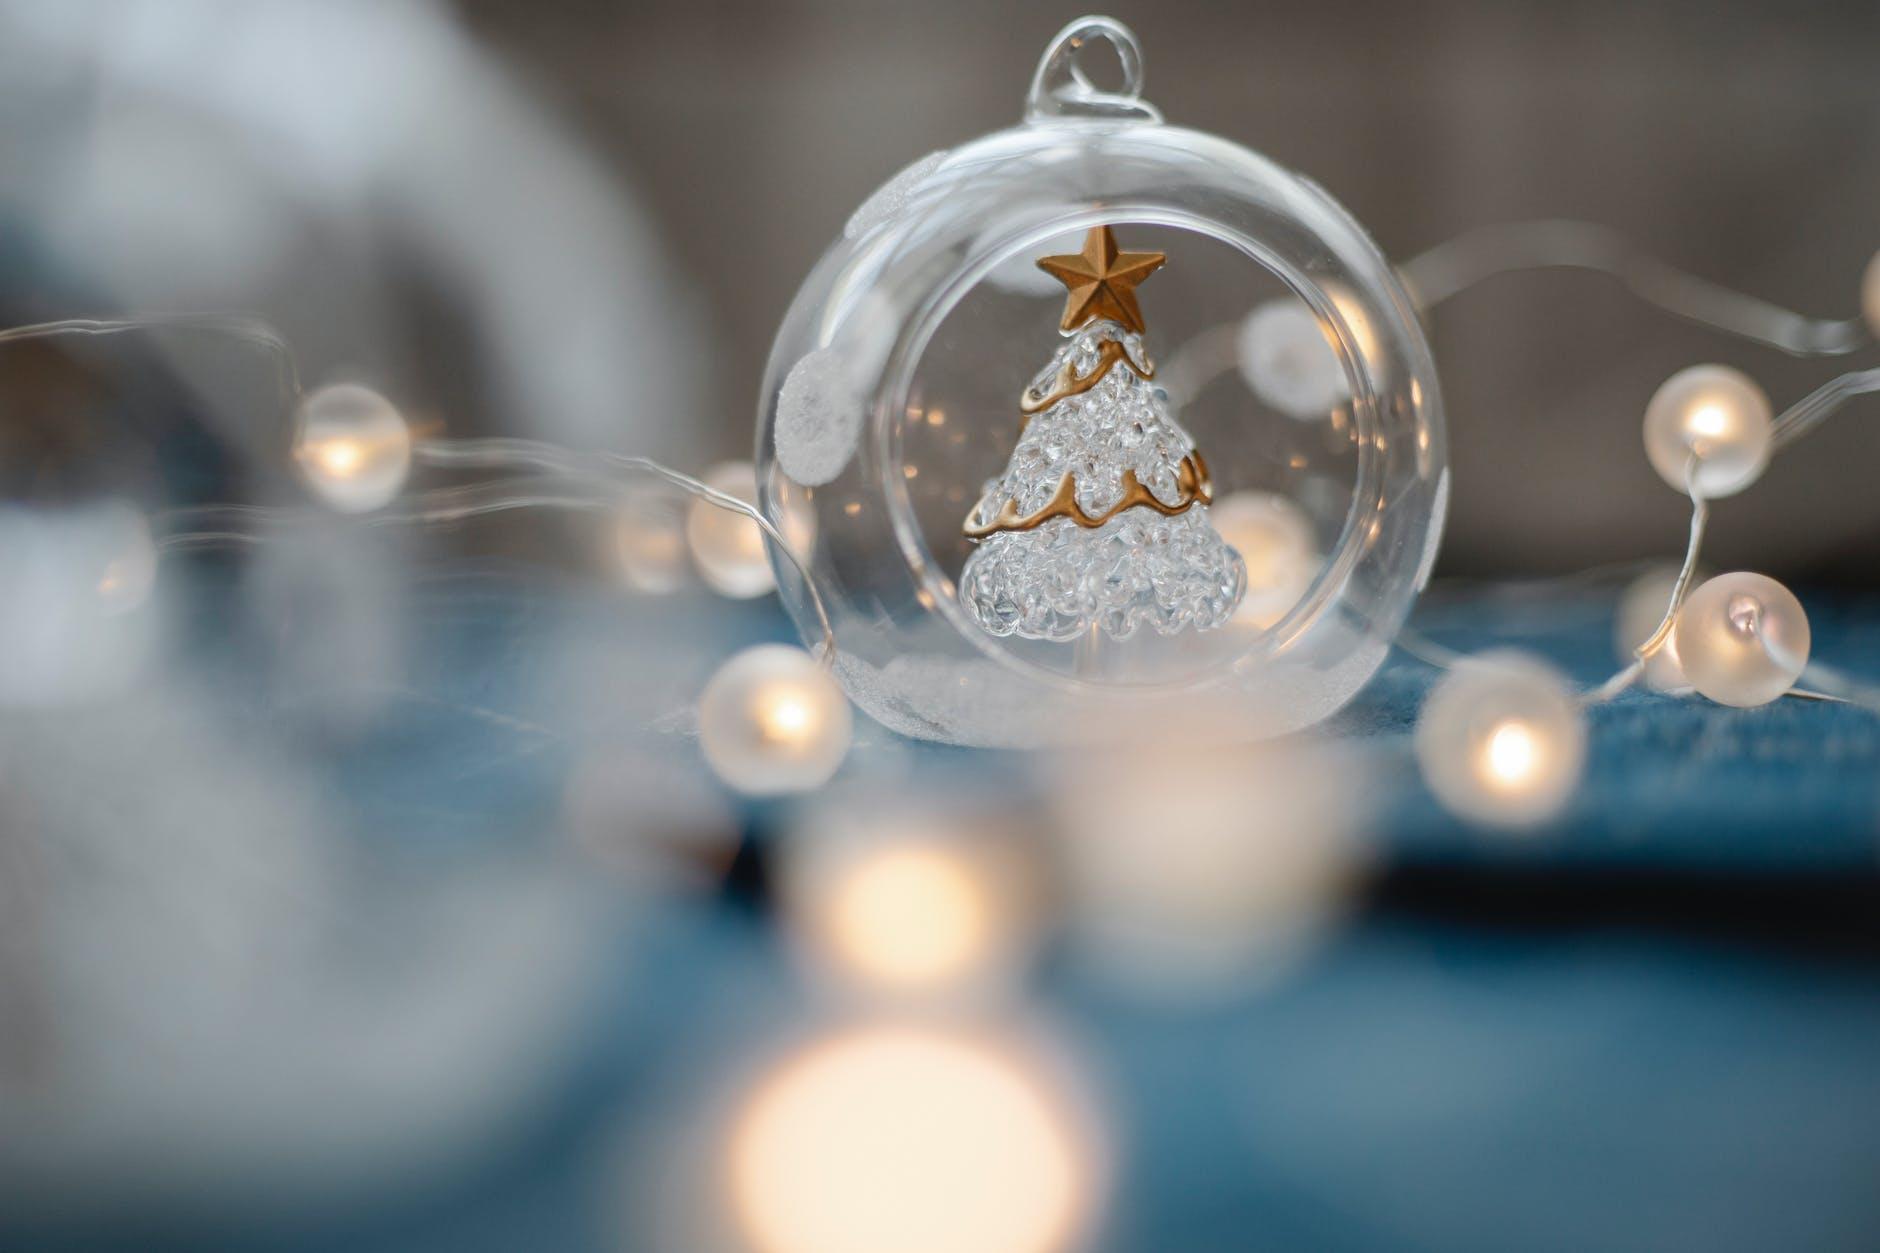 glass ball with decorative christmas tree